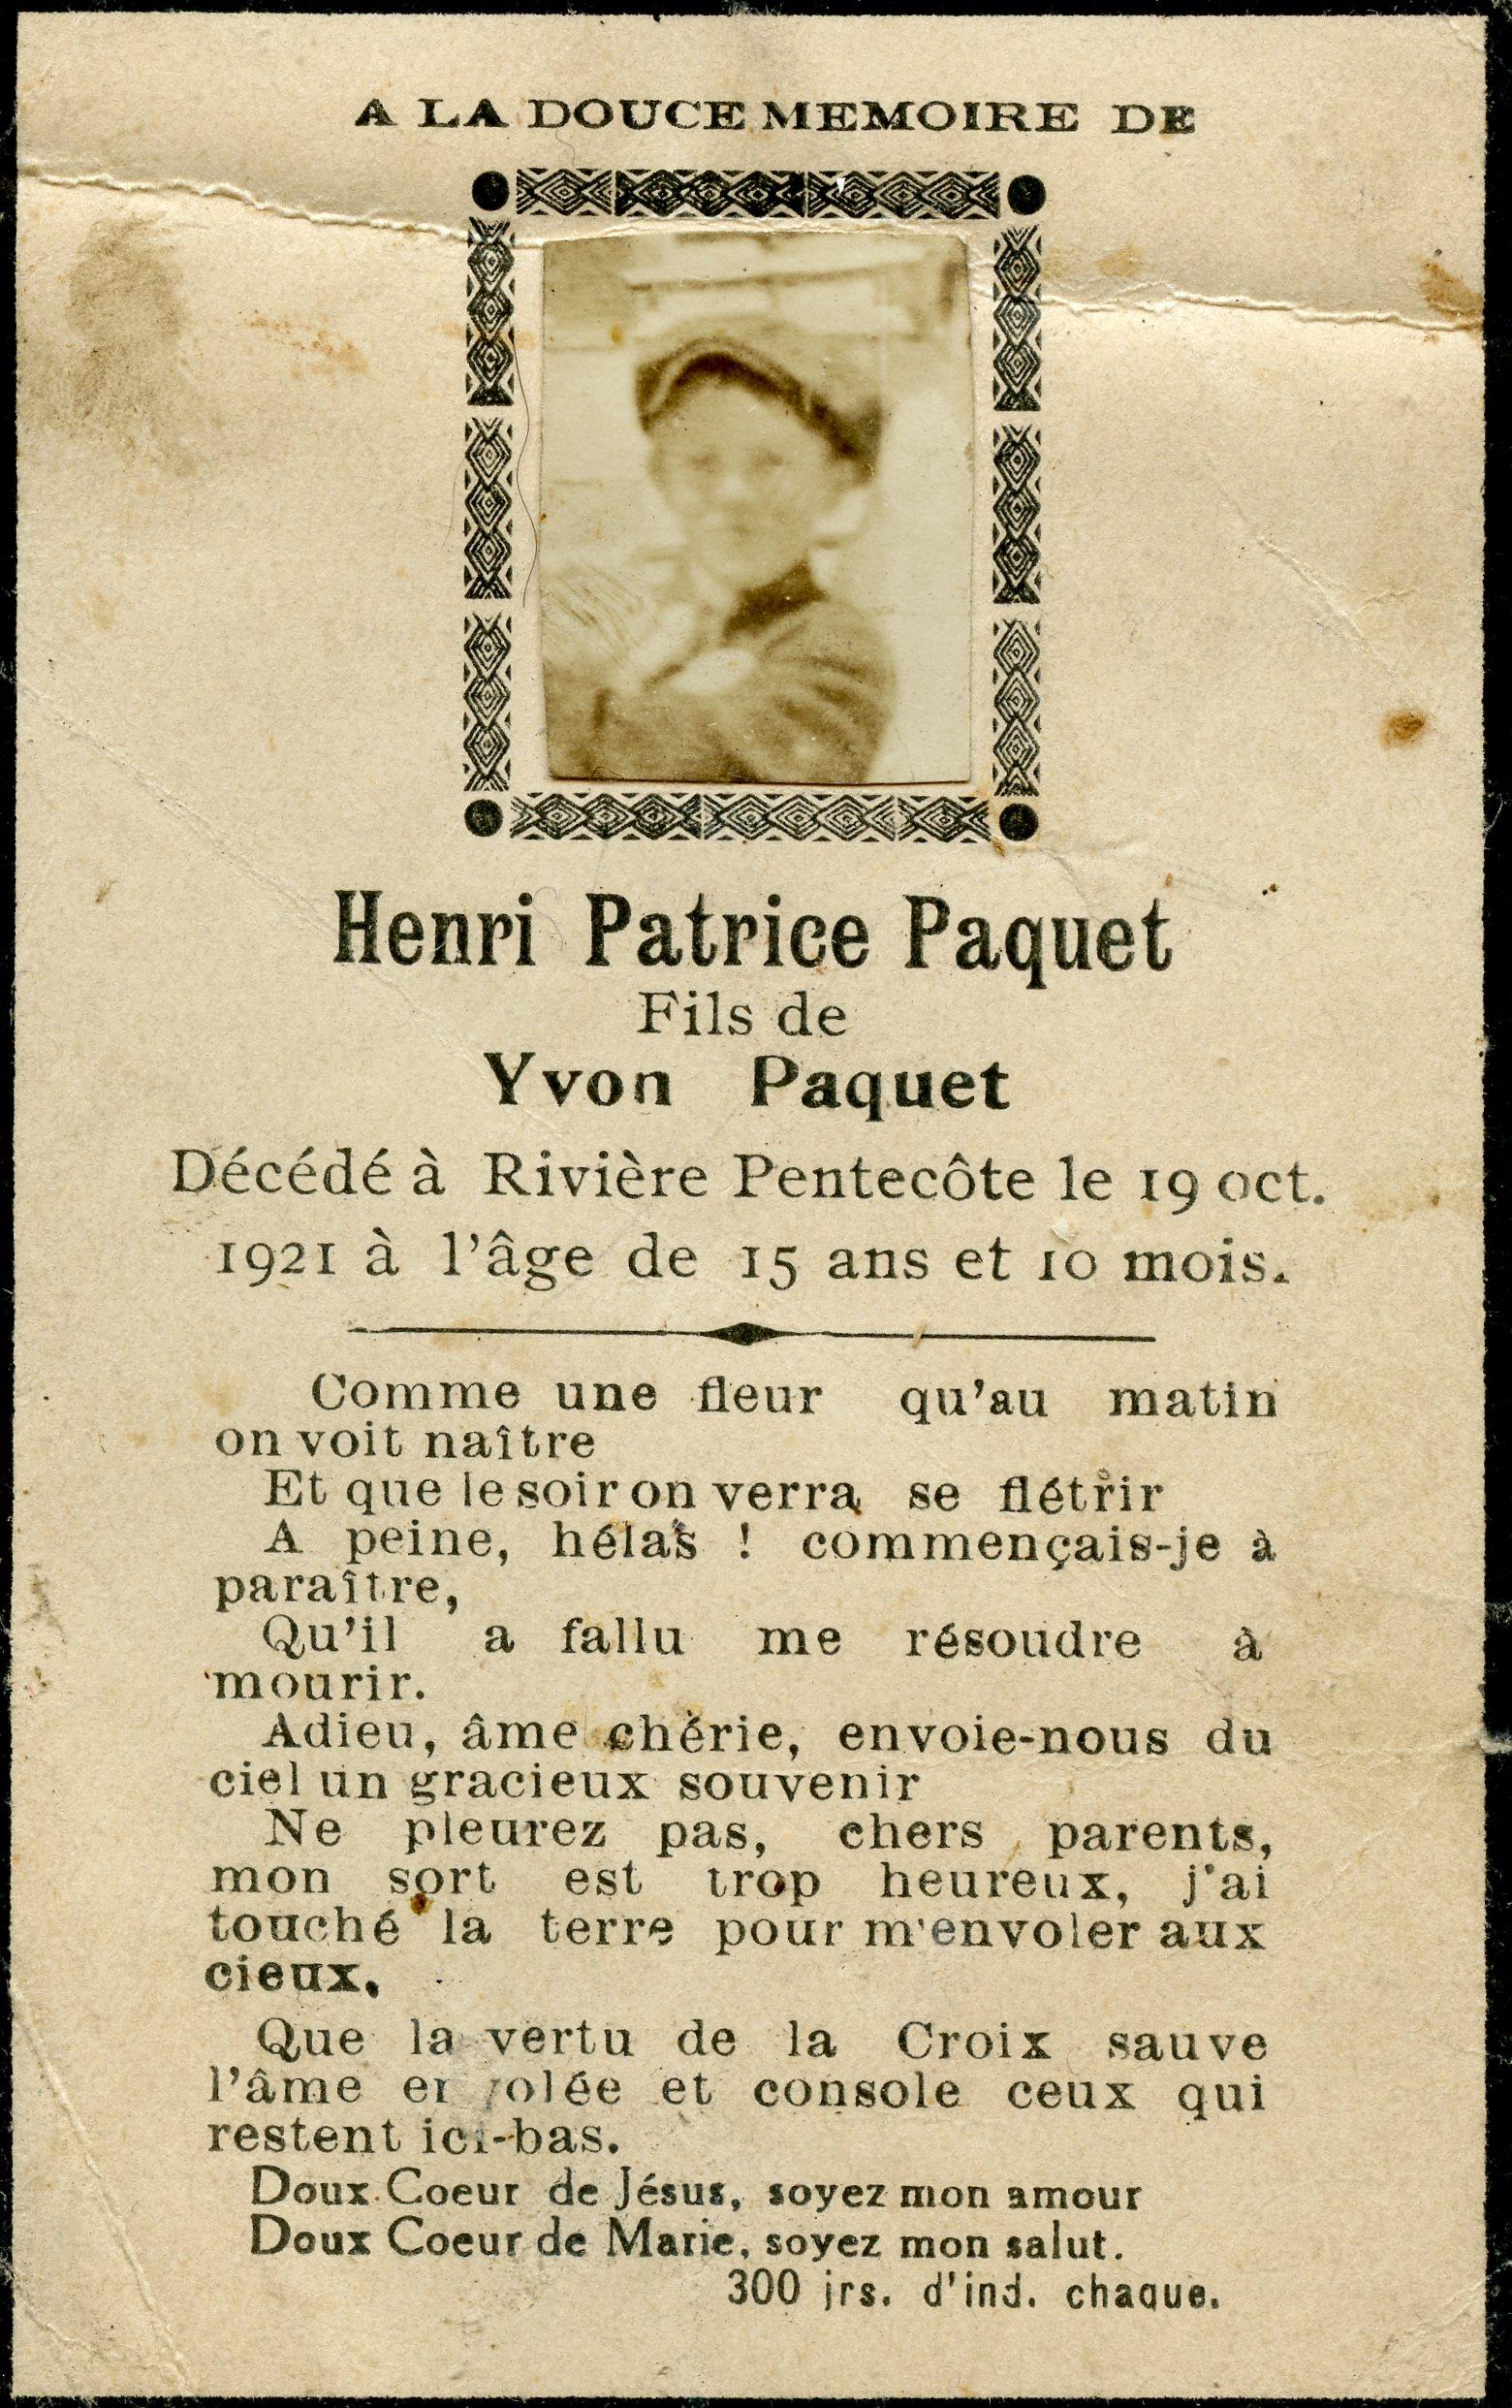 Henri Patrice Paquet 1906-1921